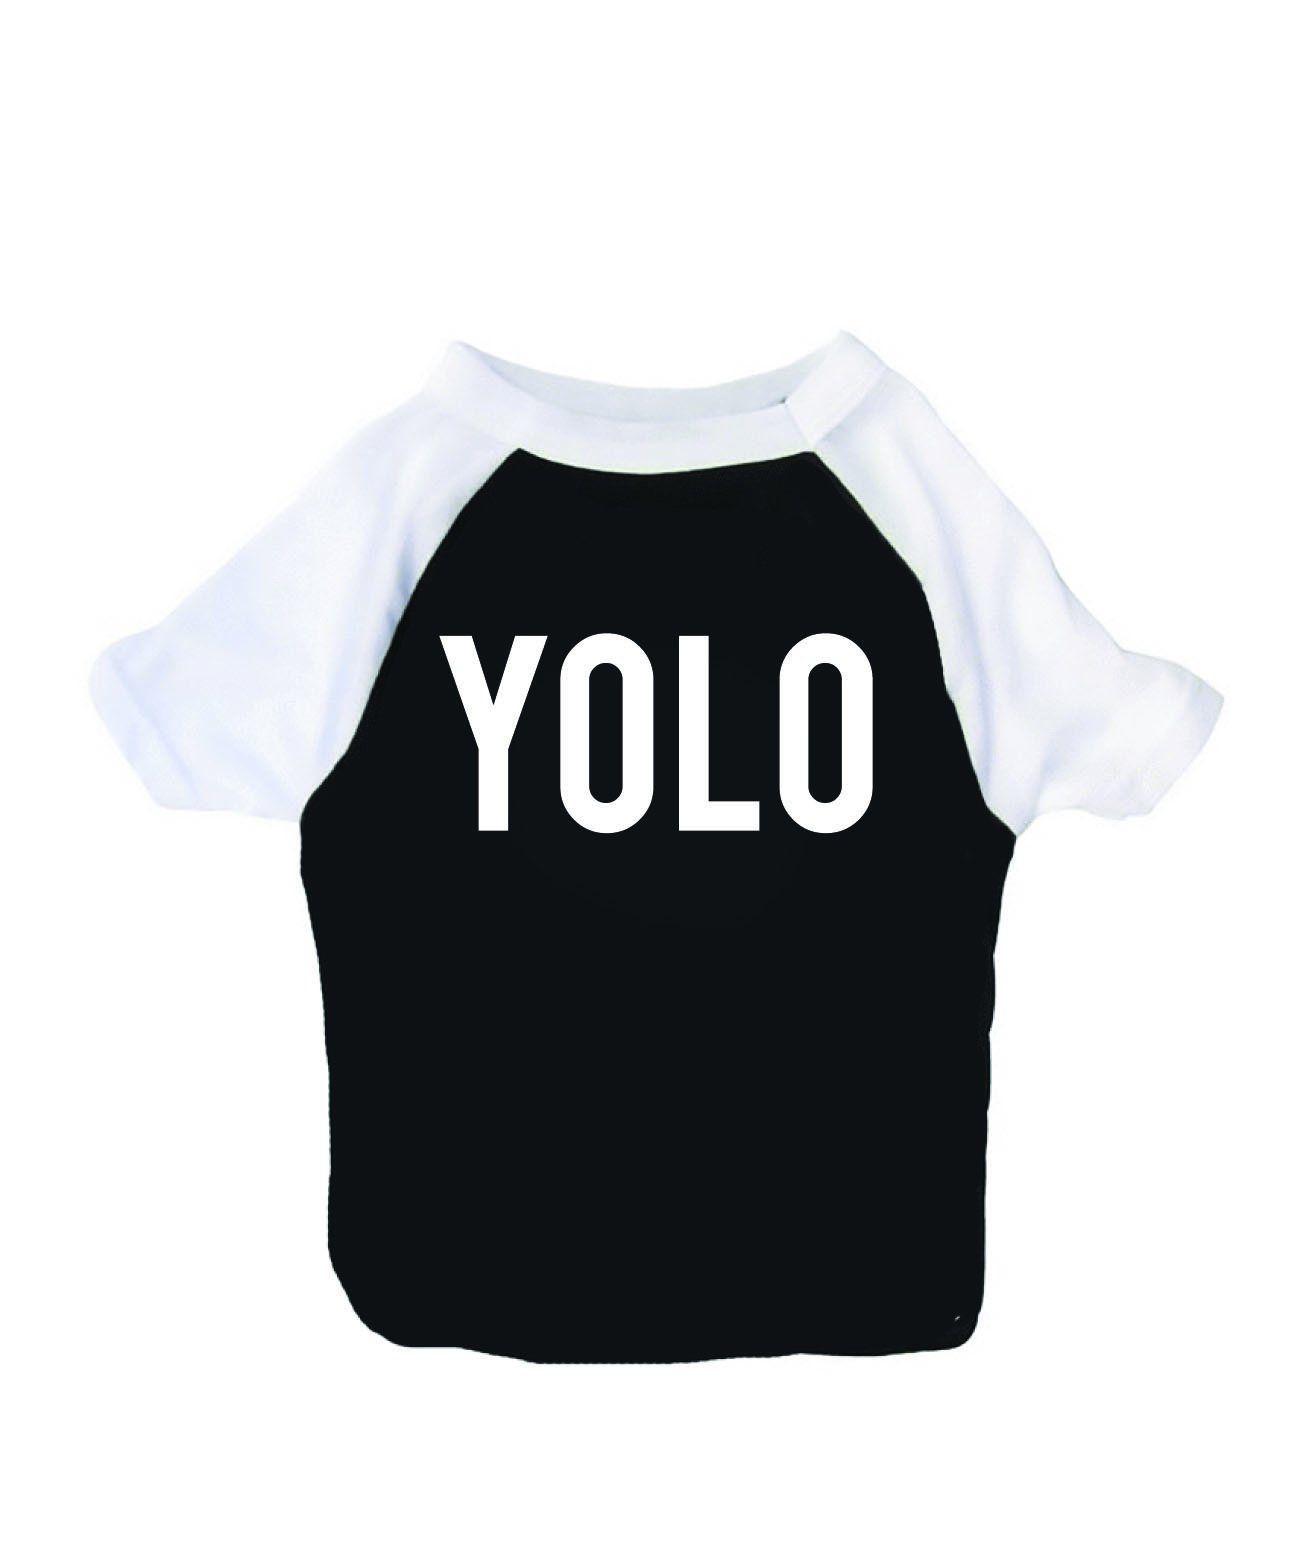 YOLO Dog T Shirt, Raglan Style Tee, Meme Pet Apparel Pet